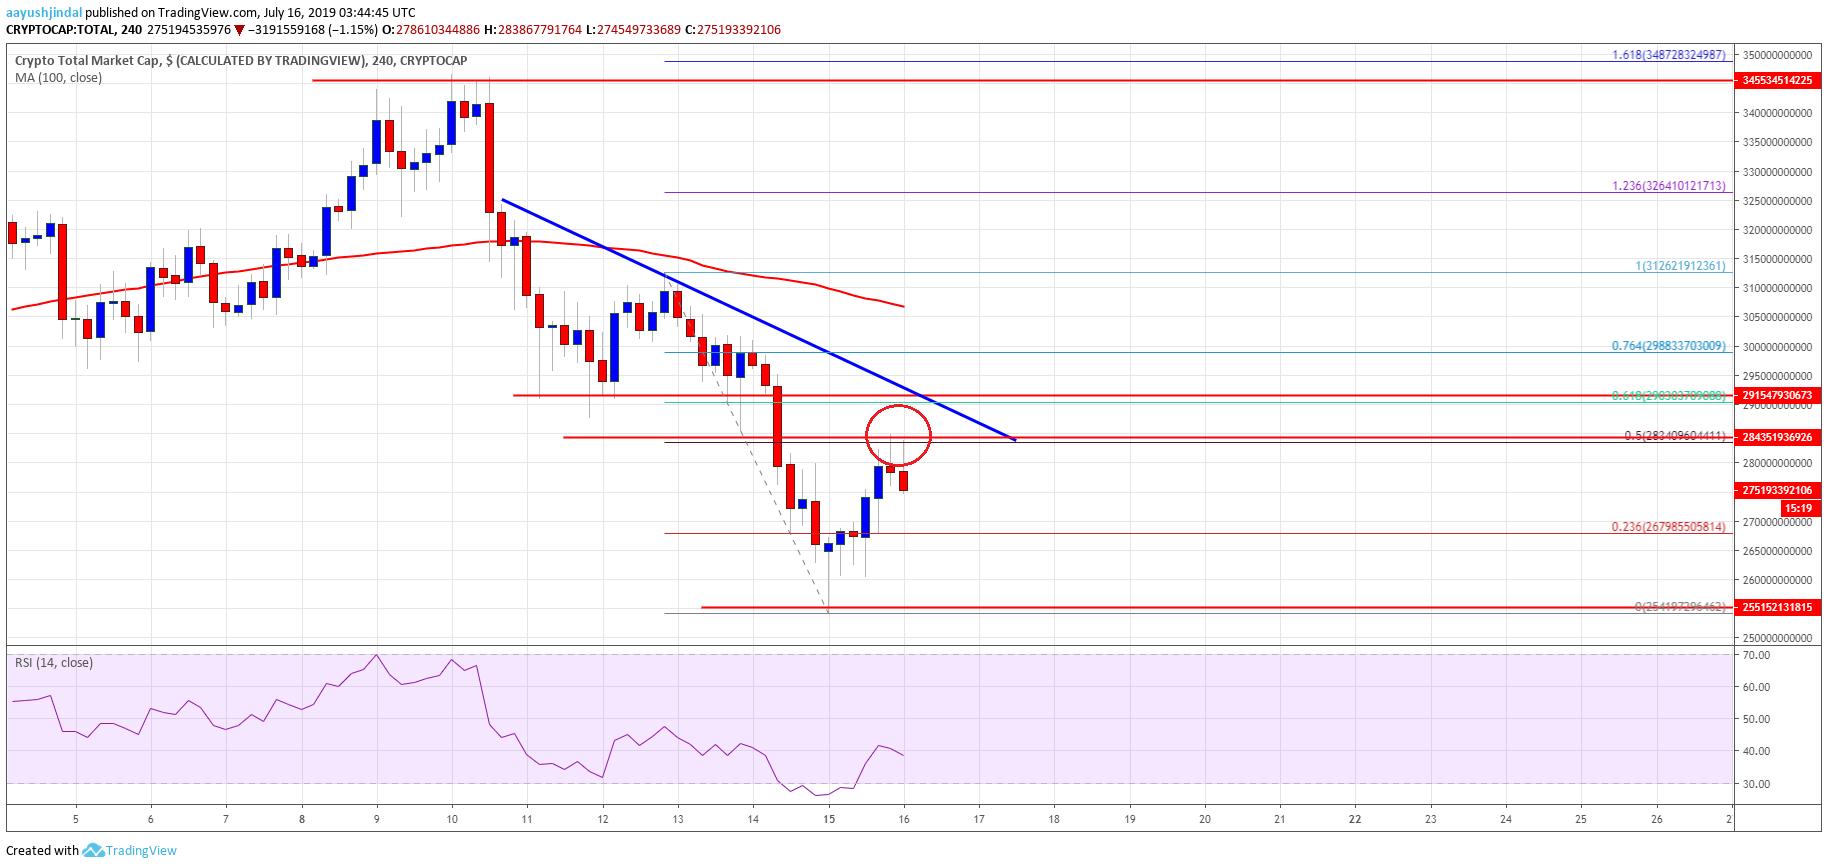 cryptocurrencies market cap and price